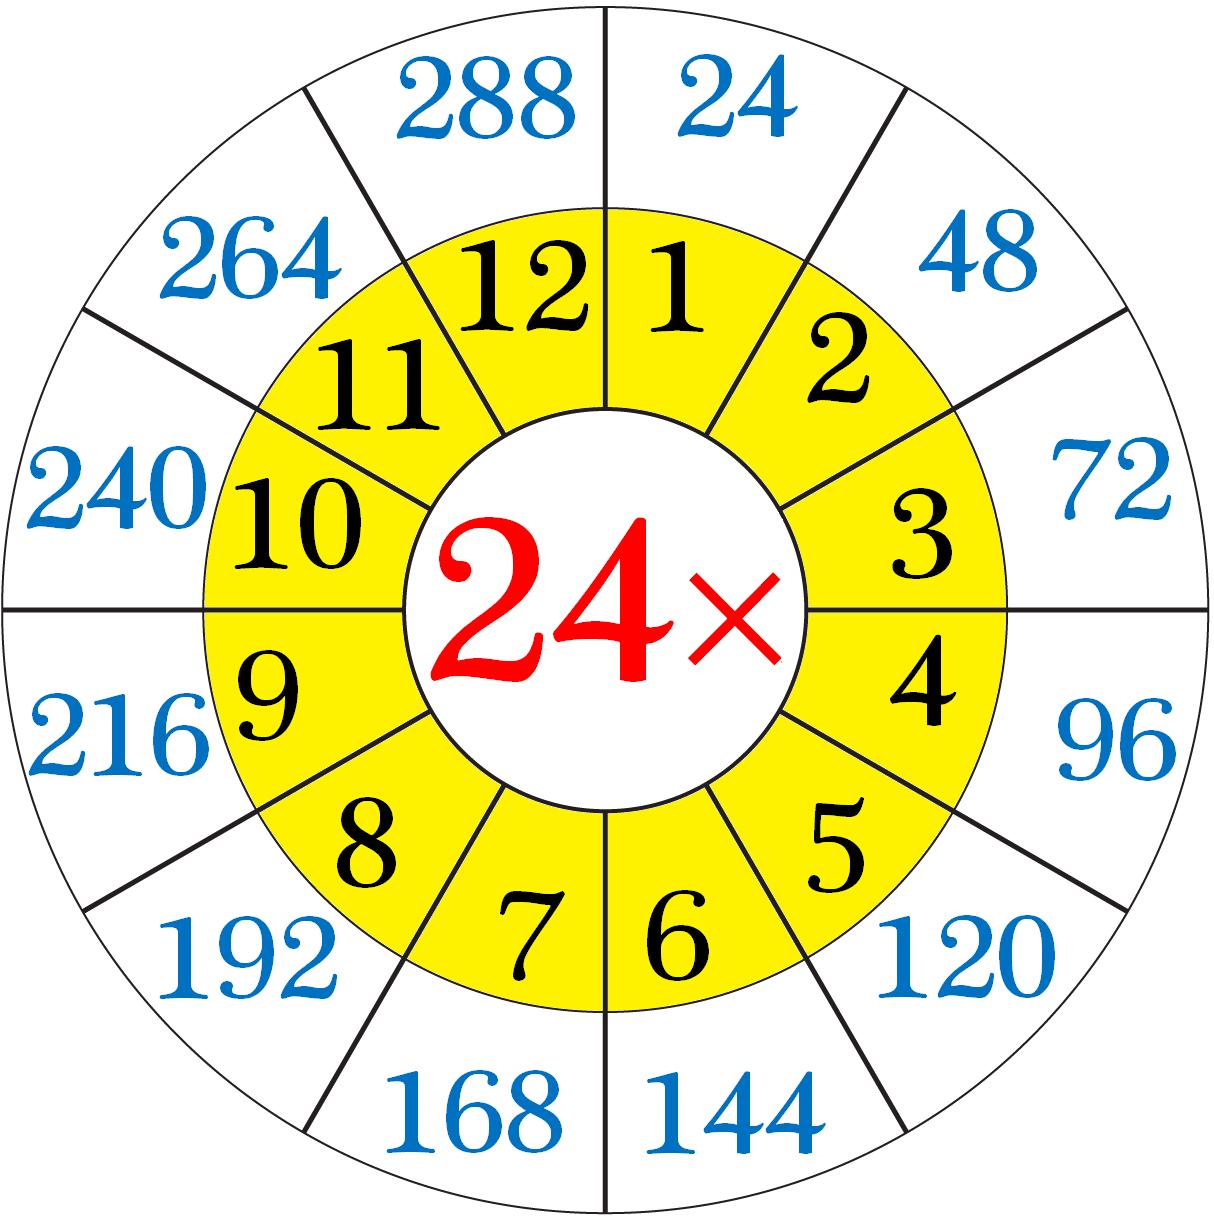 Multiplication Table of Twenty-Four